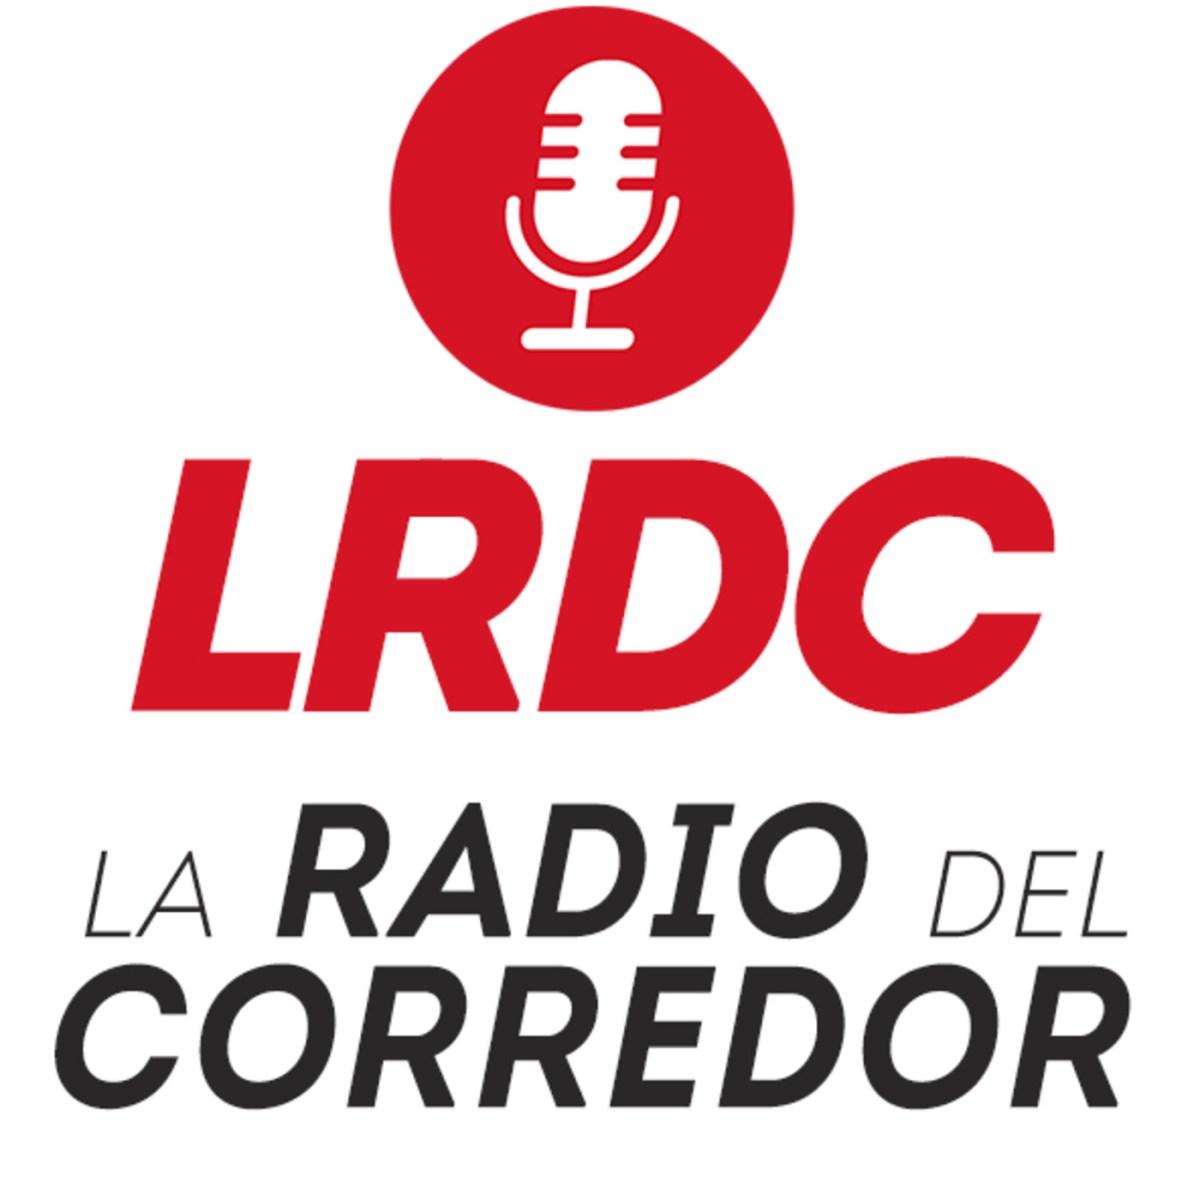 La Radio del Corredor